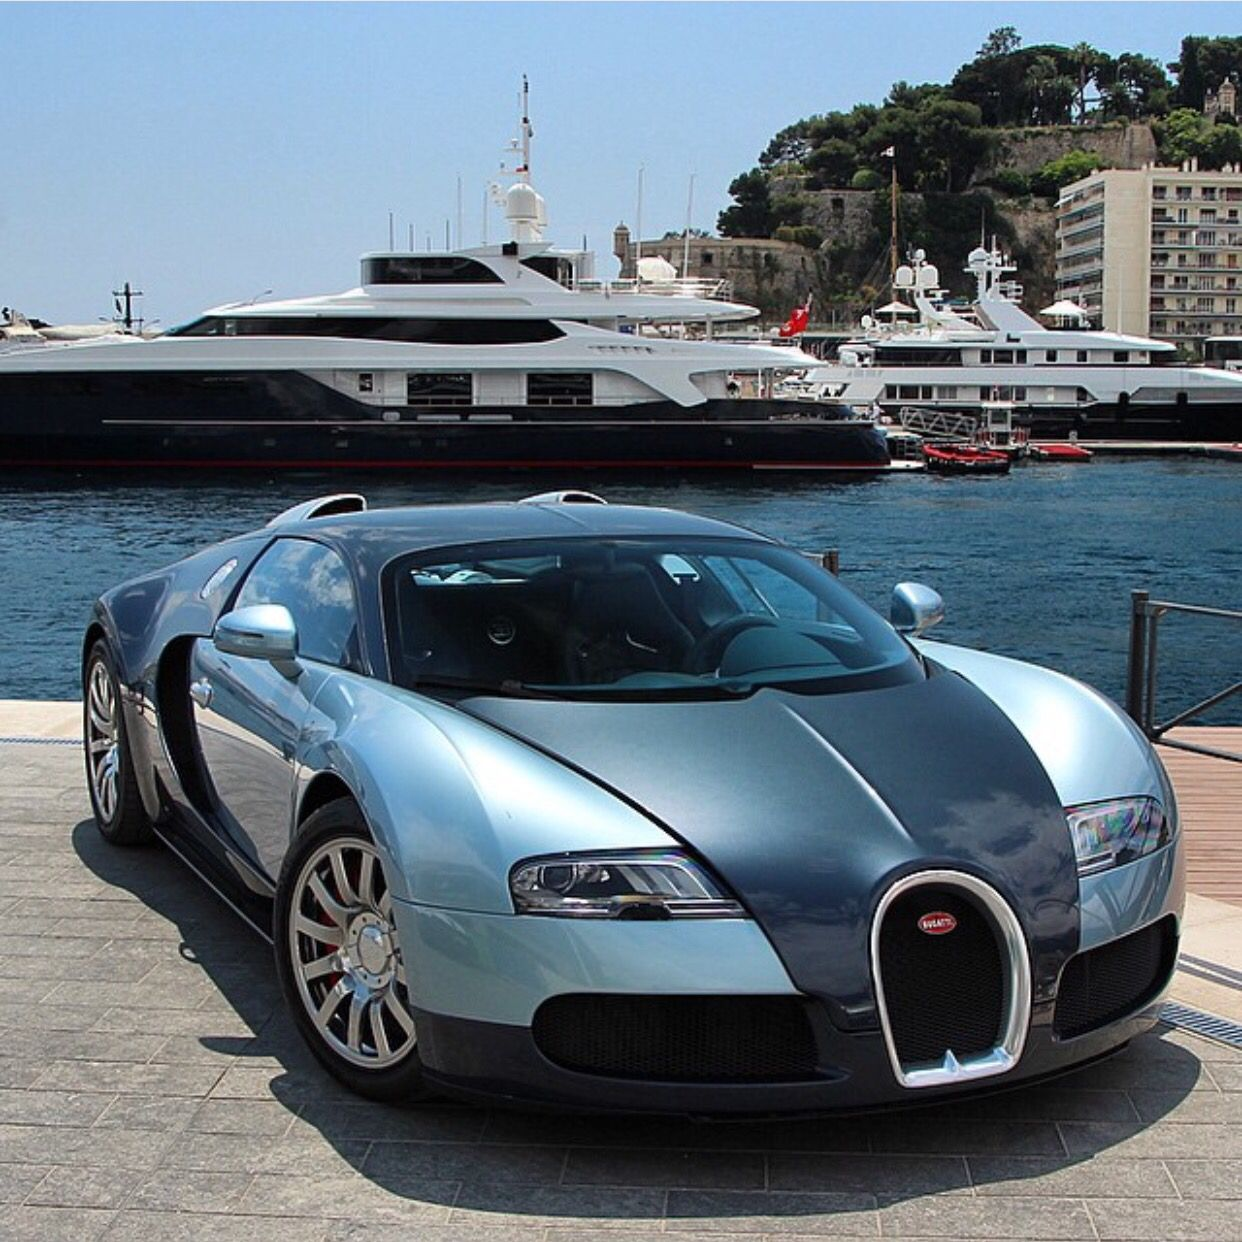 bugatti veyron painted in light & navy blue photo taken